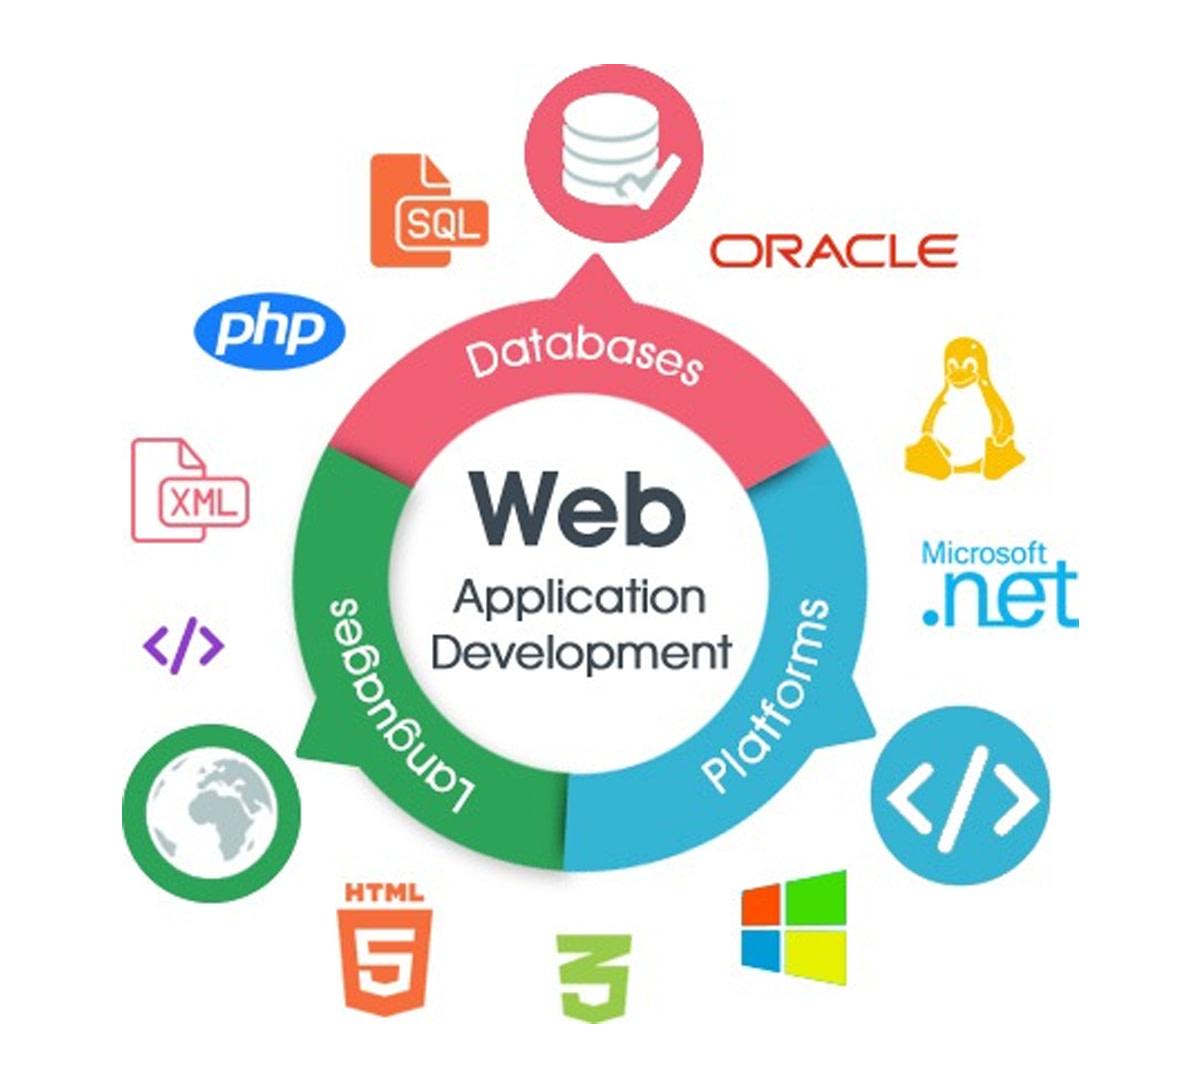 https://ml8bxbbz7pj9.i.optimole.com/kcjfi9Q.mVbO~6367f/w:auto/h:auto/q:90/https://arksstech.com/wp-content/upload/2018/06/web-development-application.png